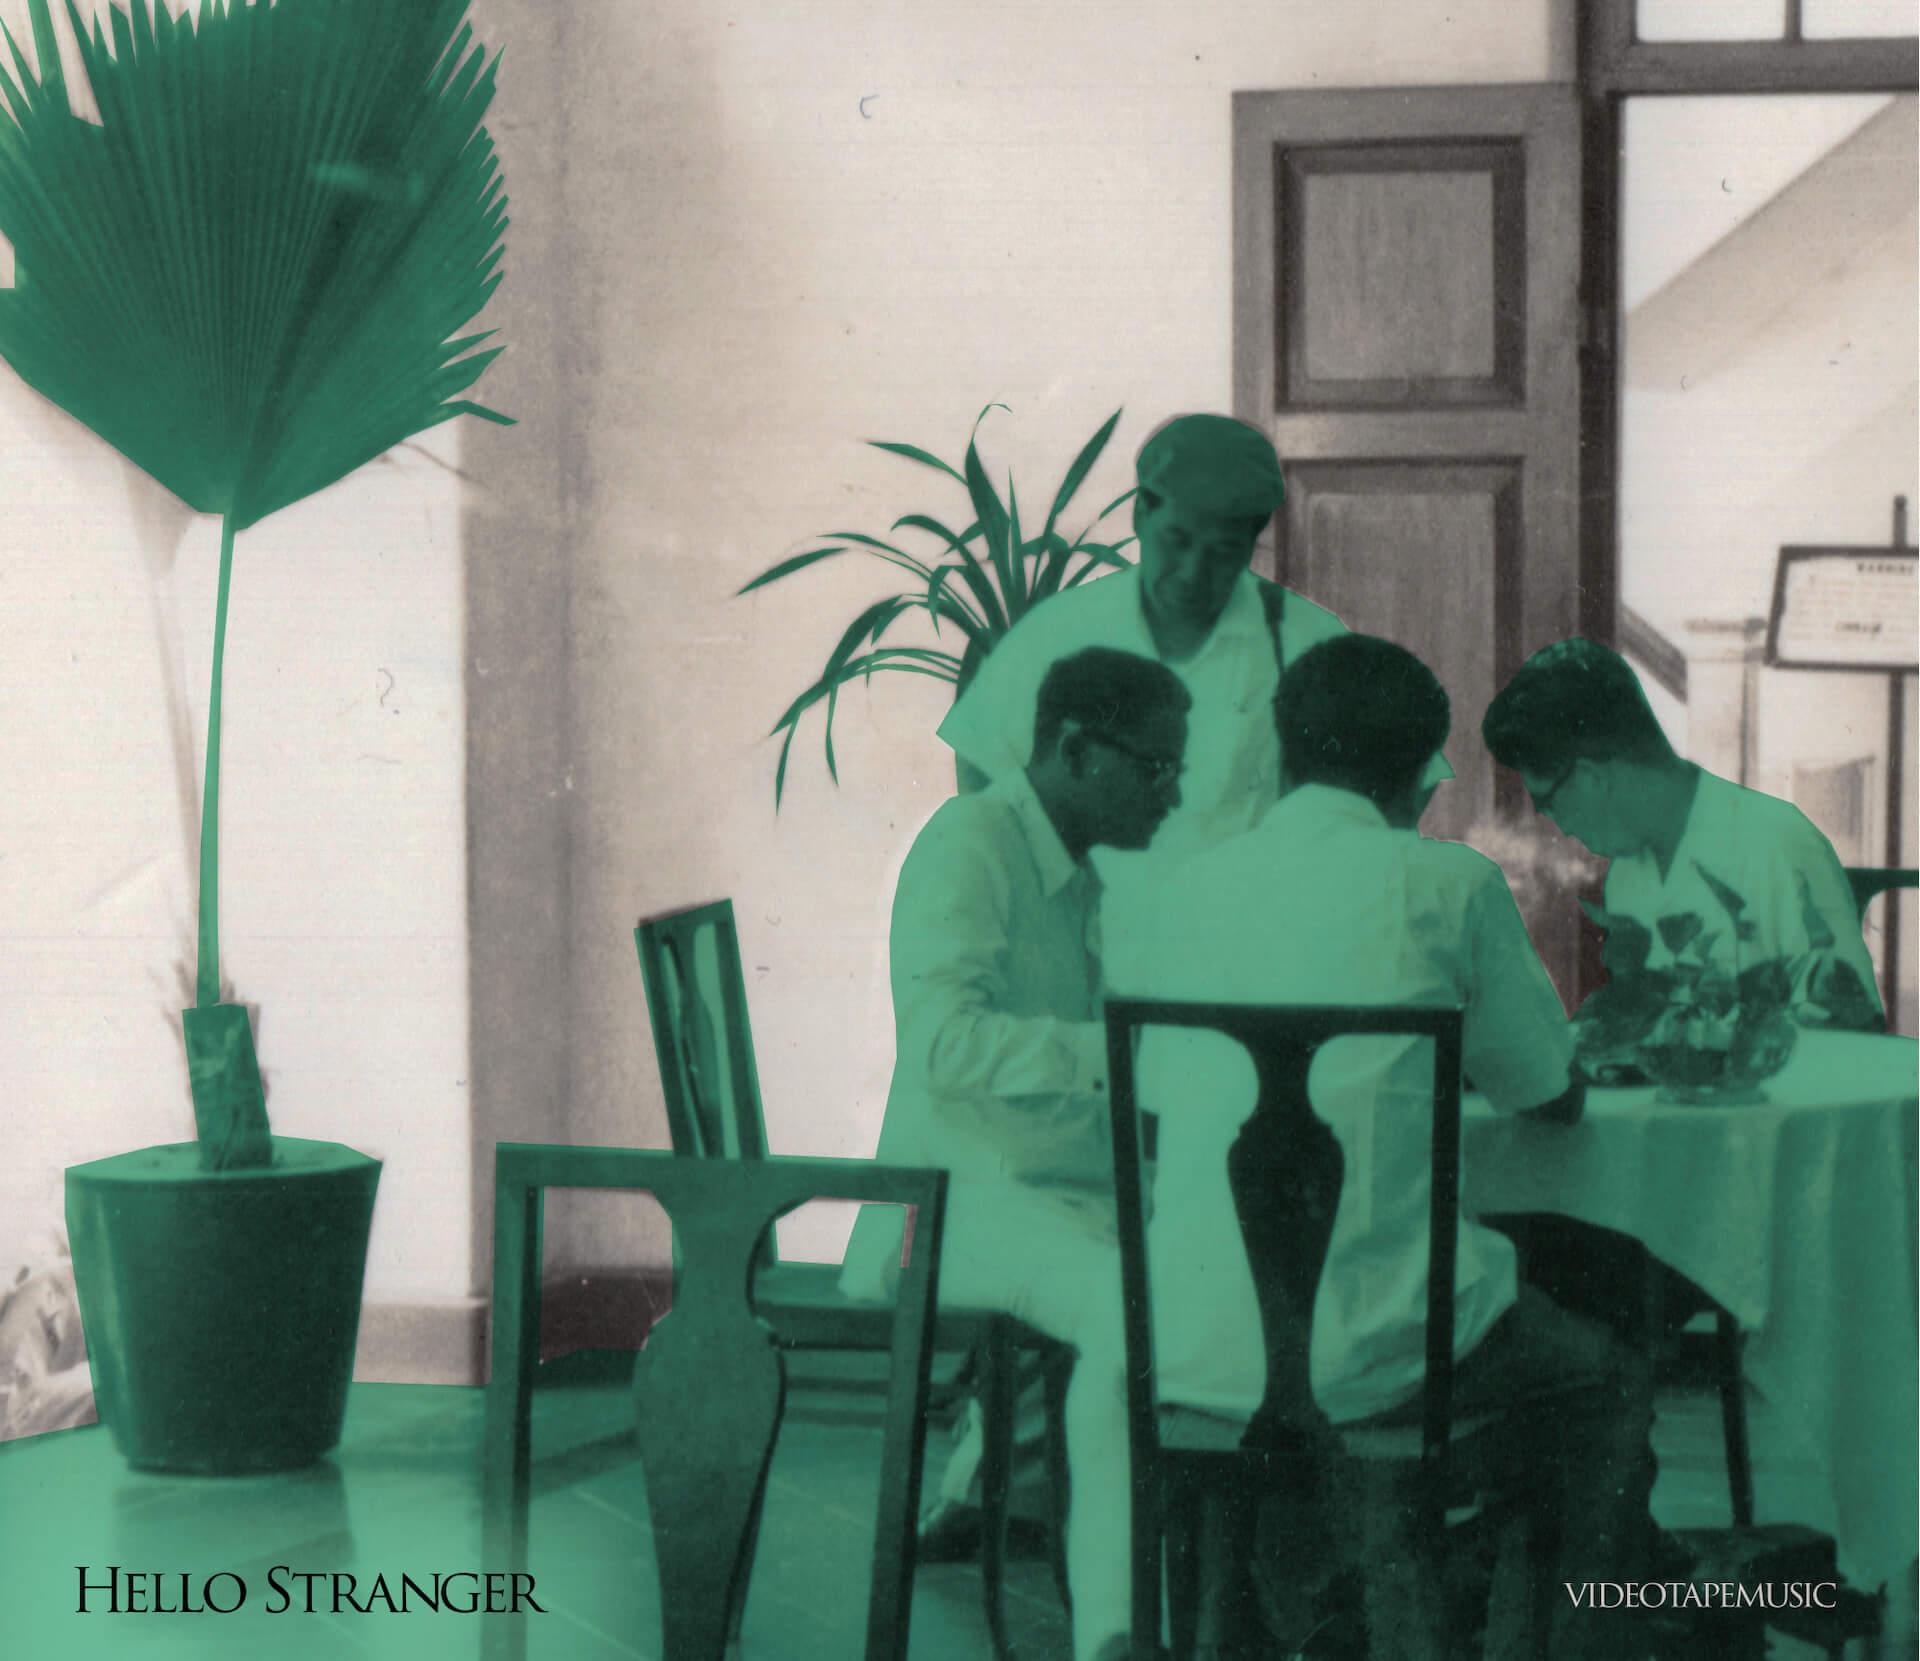 VIDEOTAPEMUSIC、〈BLACK SMOKER〉よりMIX CD『Hello Stranger』を4月20日にリリース msuci210409-videotapemusic